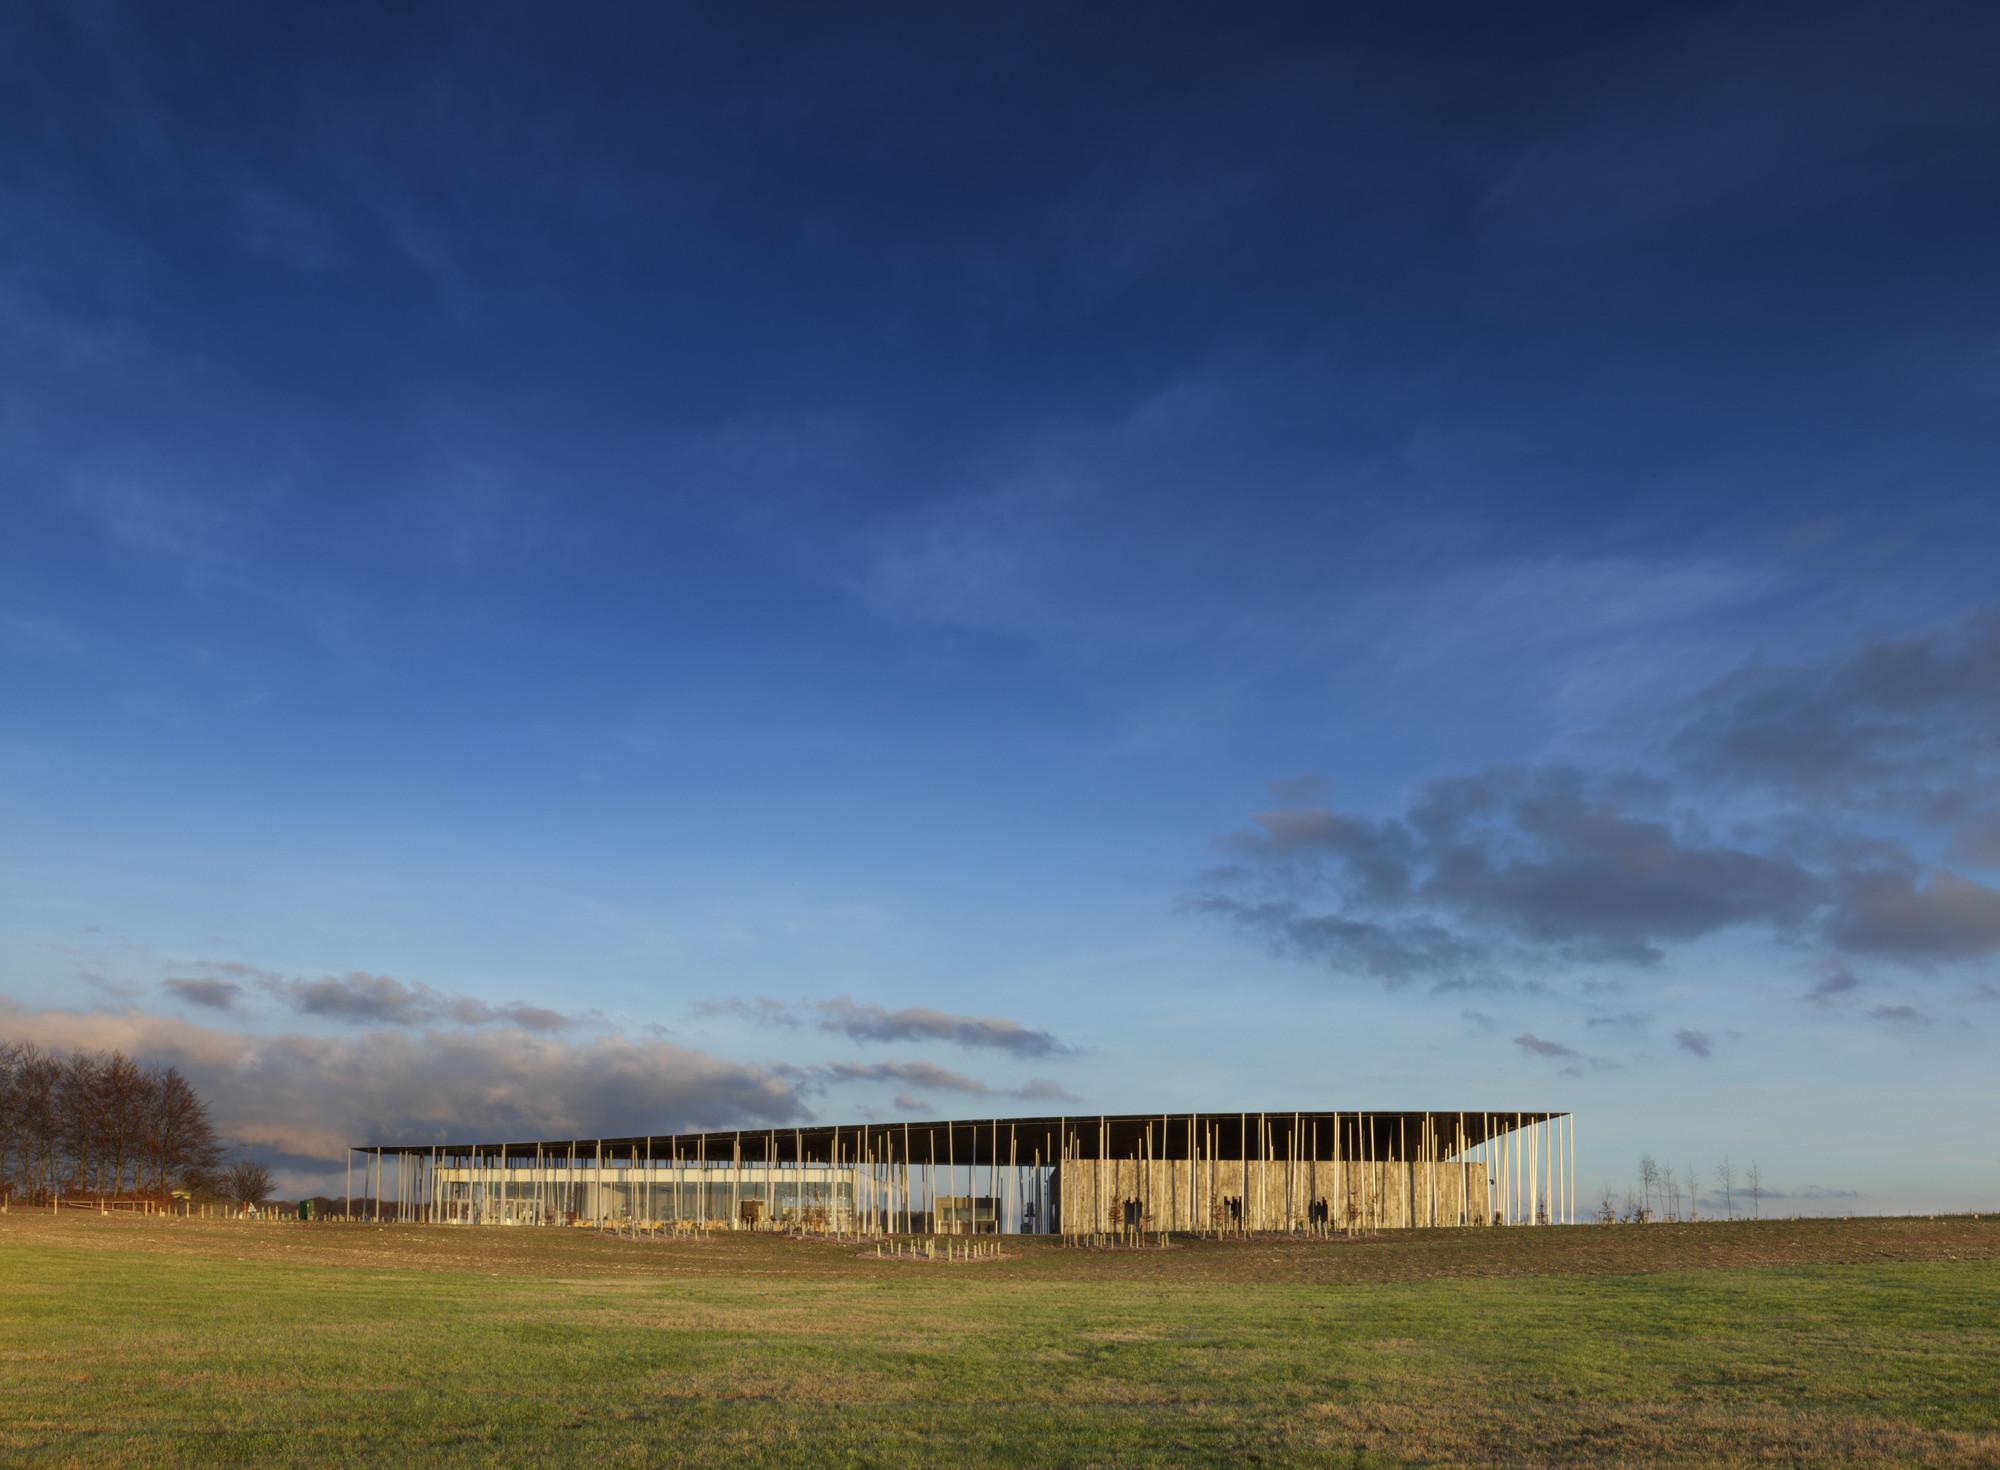 Australian Institute of Architects Awards Best Overseas Projects by Australian Architects, Stonehenge Exhibition + Visitor Centre / Denton Corker Marshall. Image © James Davies